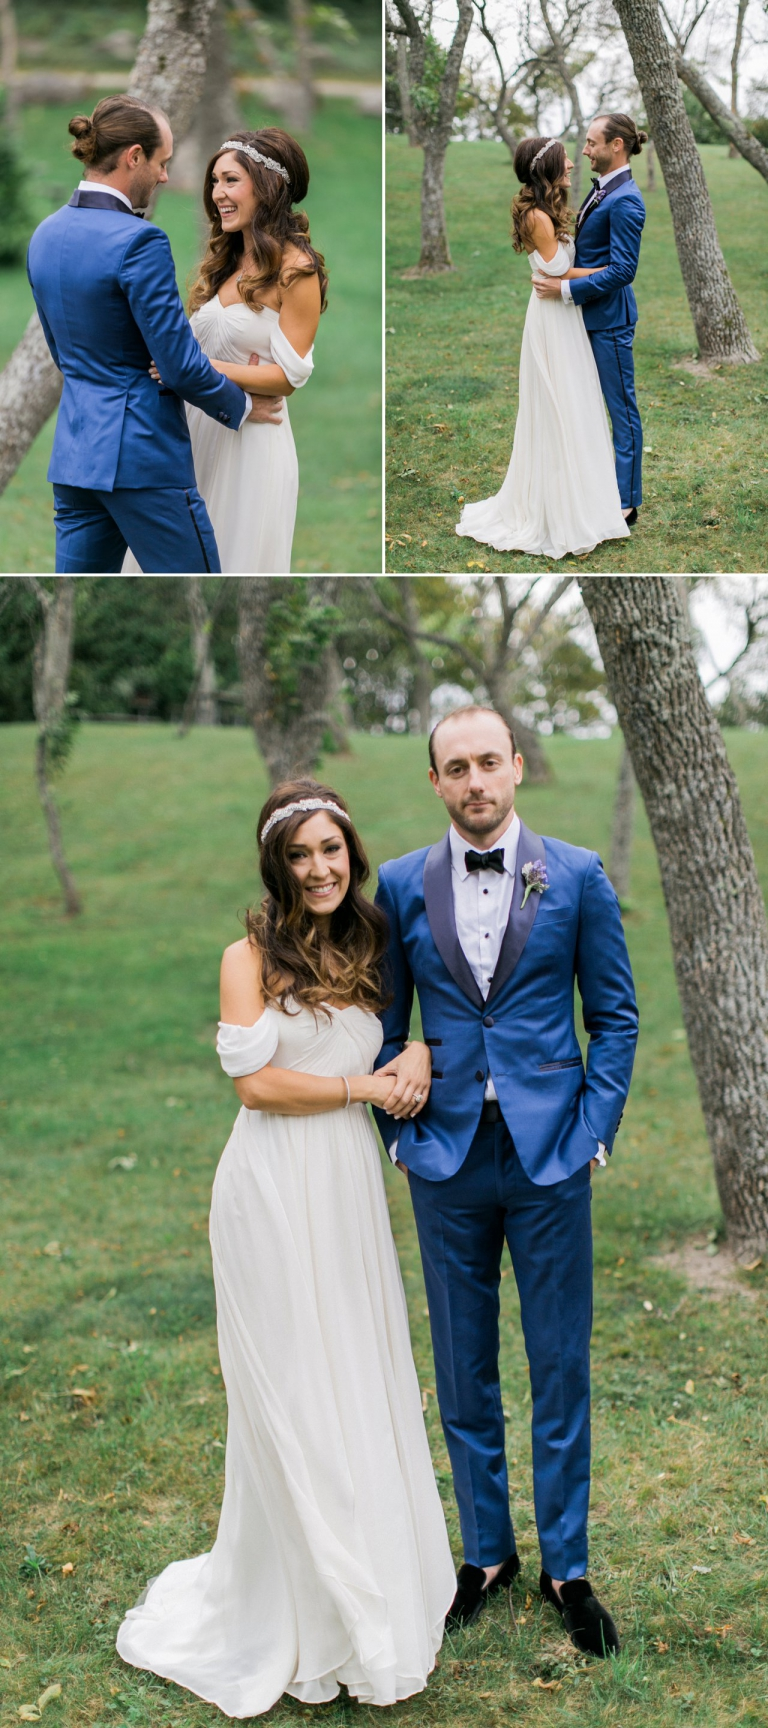 Northport Michigan Wedding Photography | The Weber Photographers | Cory Weber